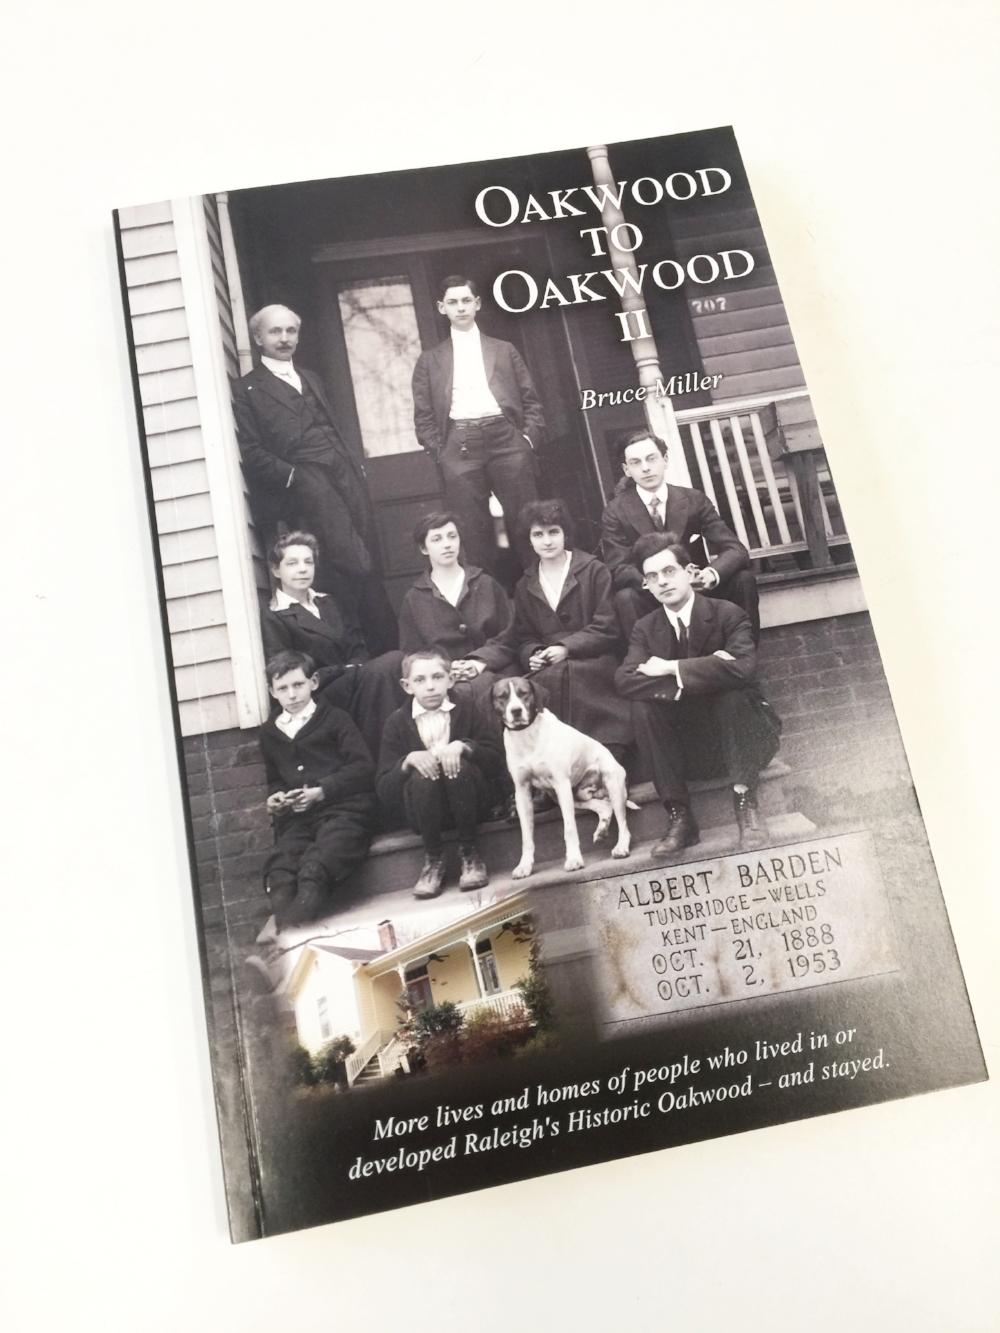 Oakwood to Oakwood II | Graphic Design by Cybergraph